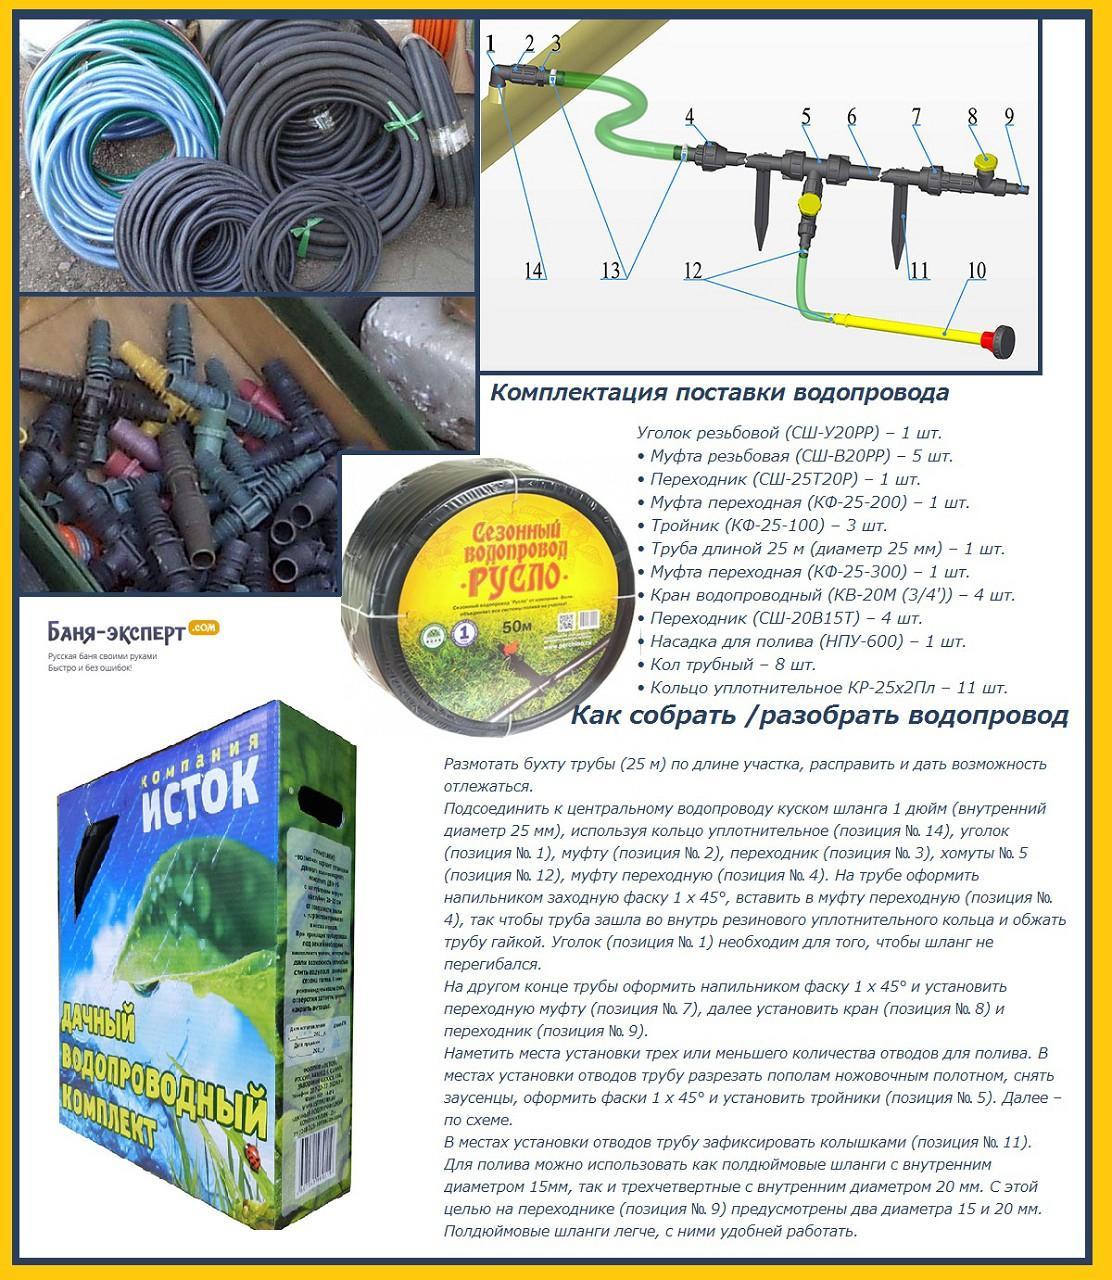 Летний водопровод, его элементы и сборка/разборка